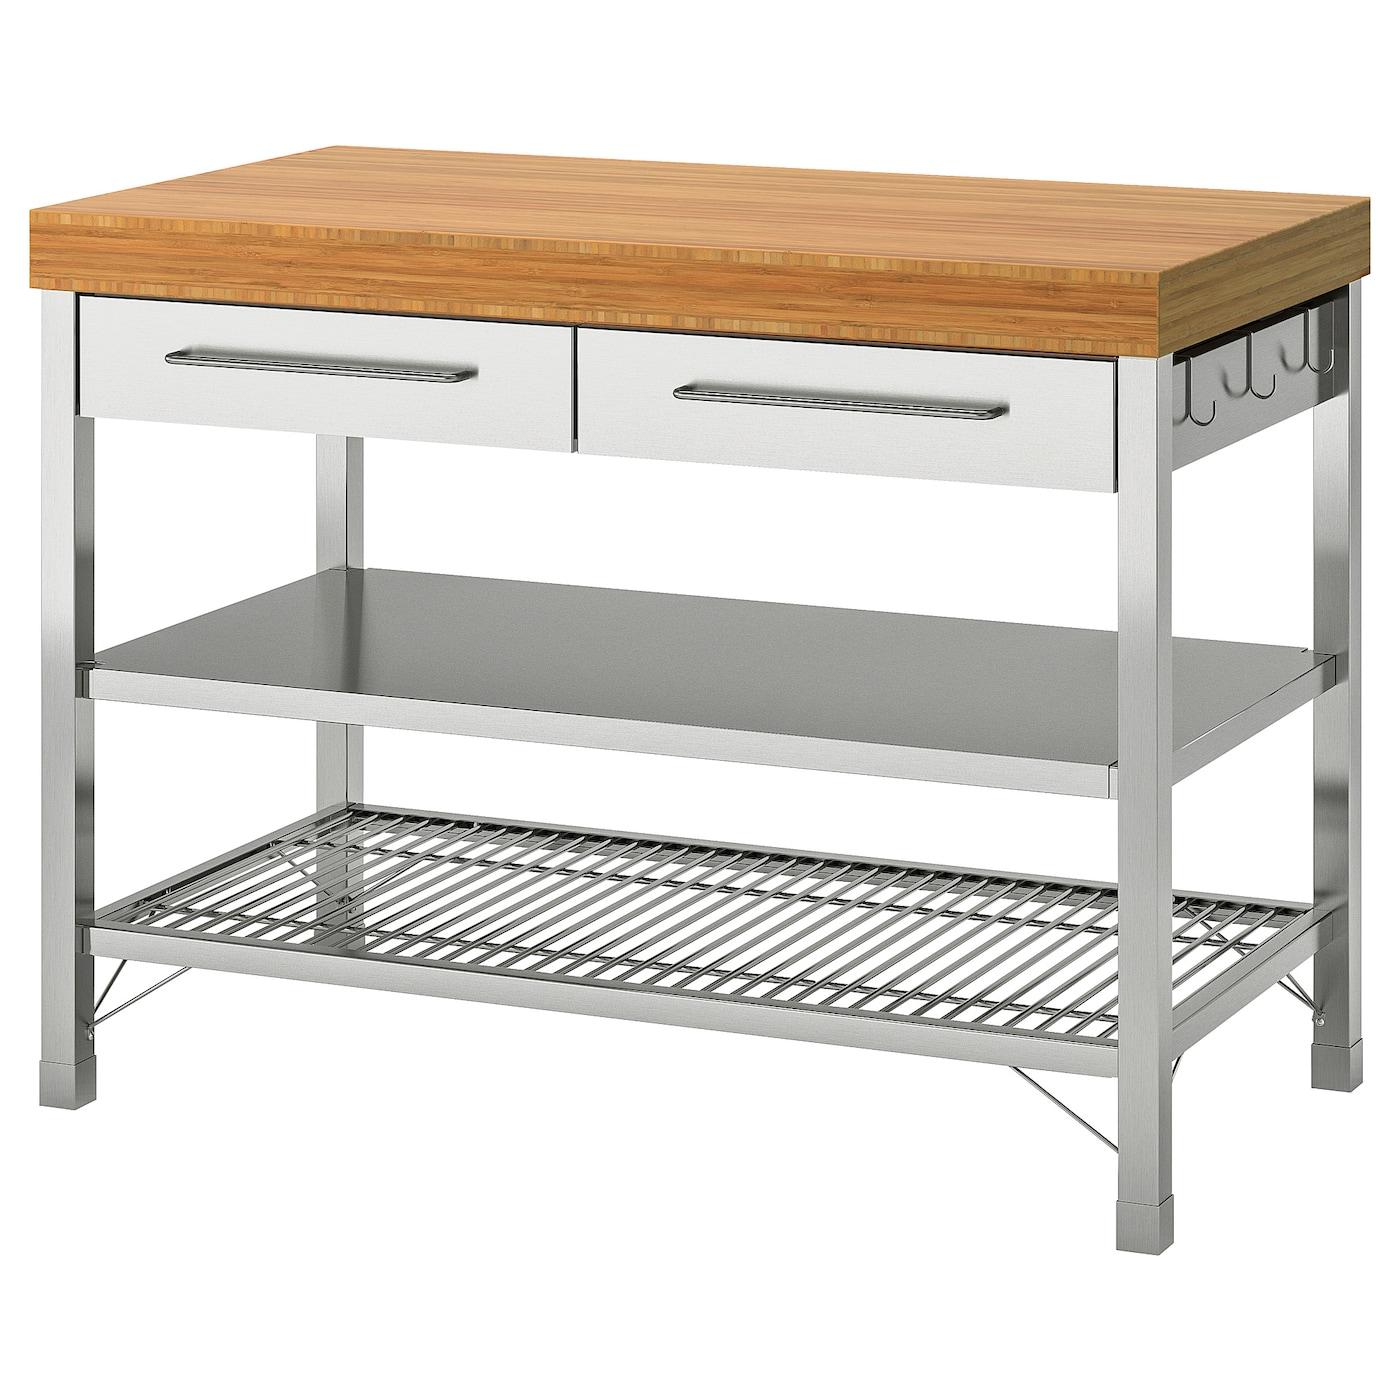 Mensole Legno Cucina Ikea rimforsa work bench - stainless steel, bamboo 120x63.5x92 cm